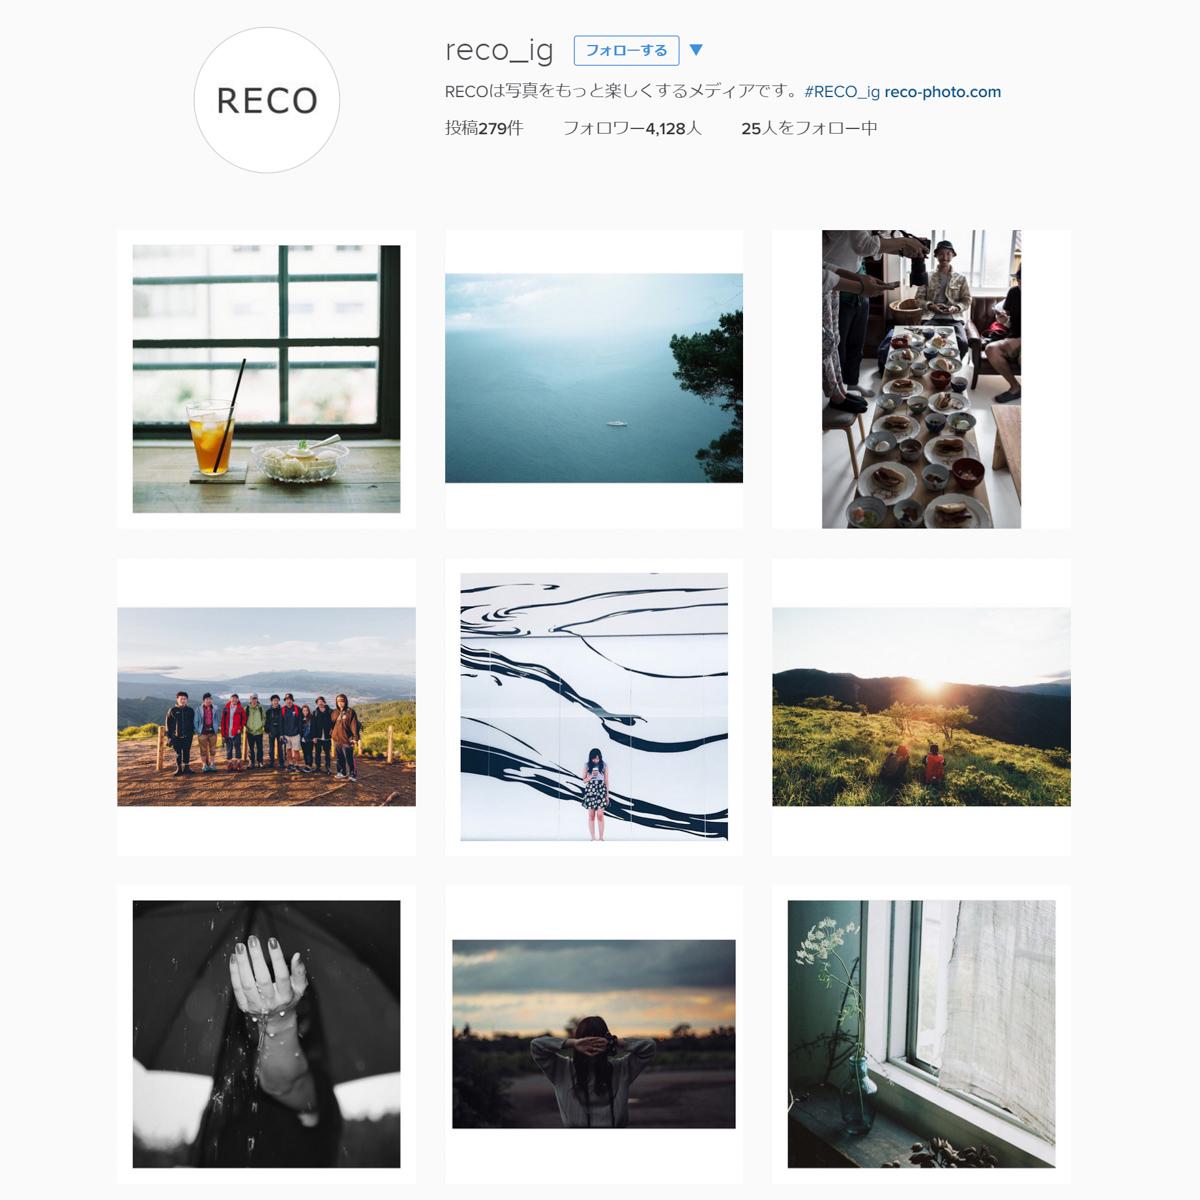 Tuck-screenshot-instagram.com 2015-07-17 18-35-46